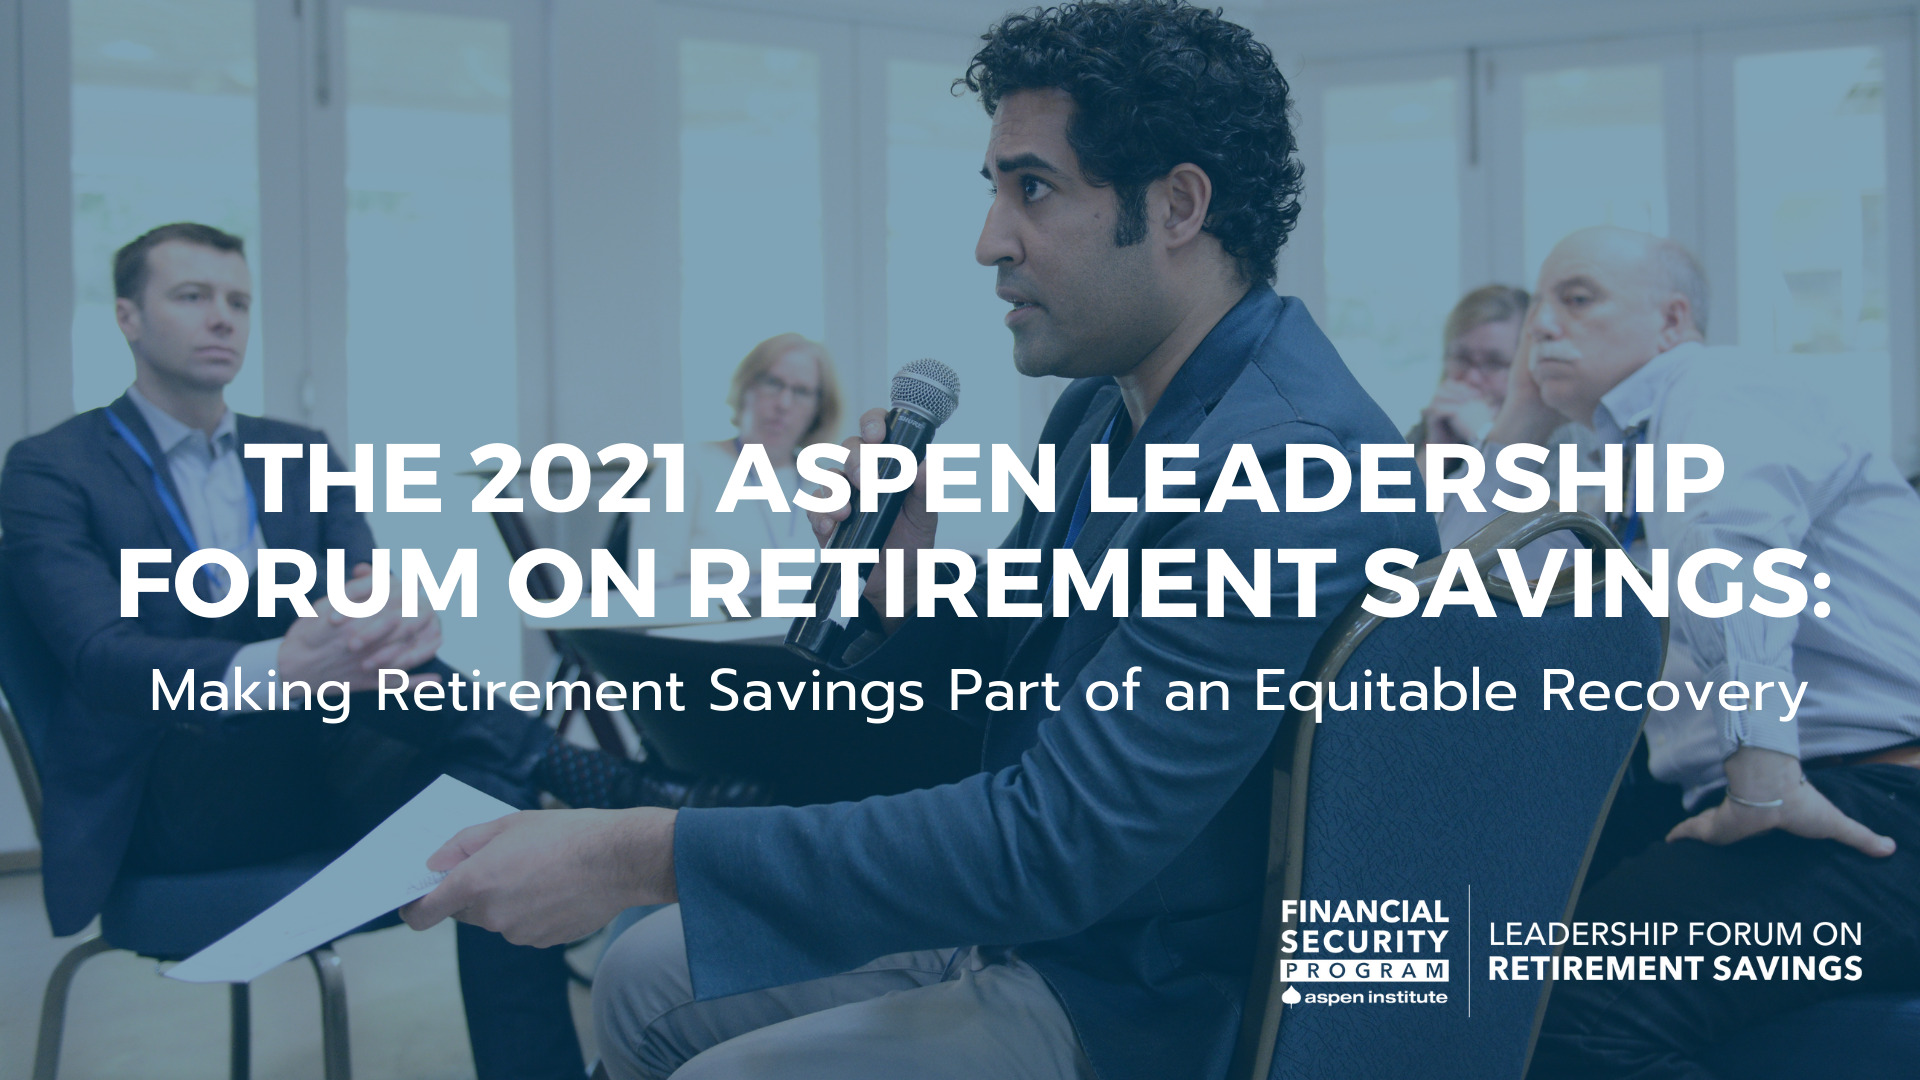 The 2021 Aspen Leadership Forum on Retirement Savings